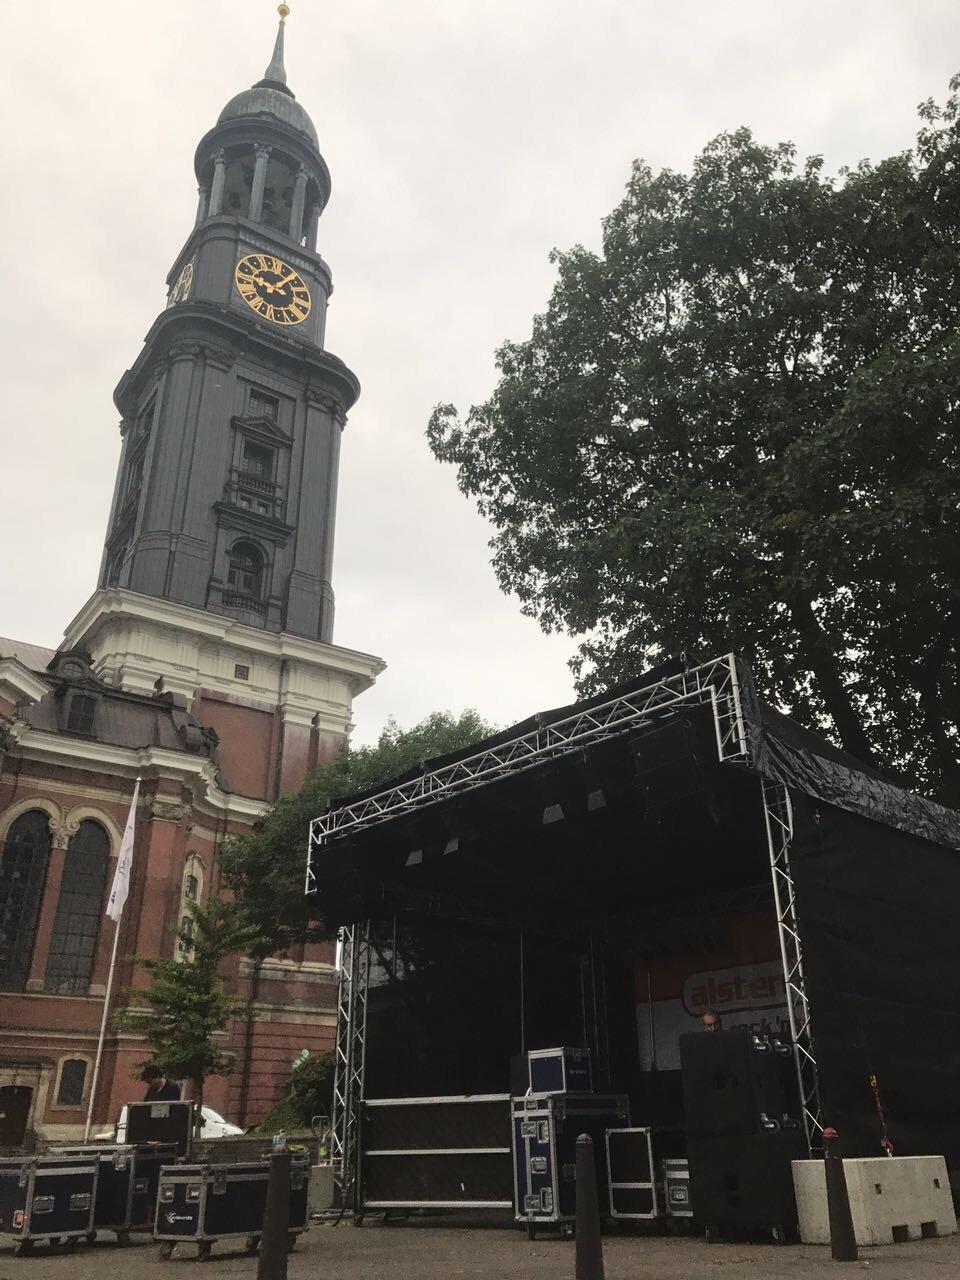 MoGo 2017 Kirchenvorplatz mit Turm und Bühne